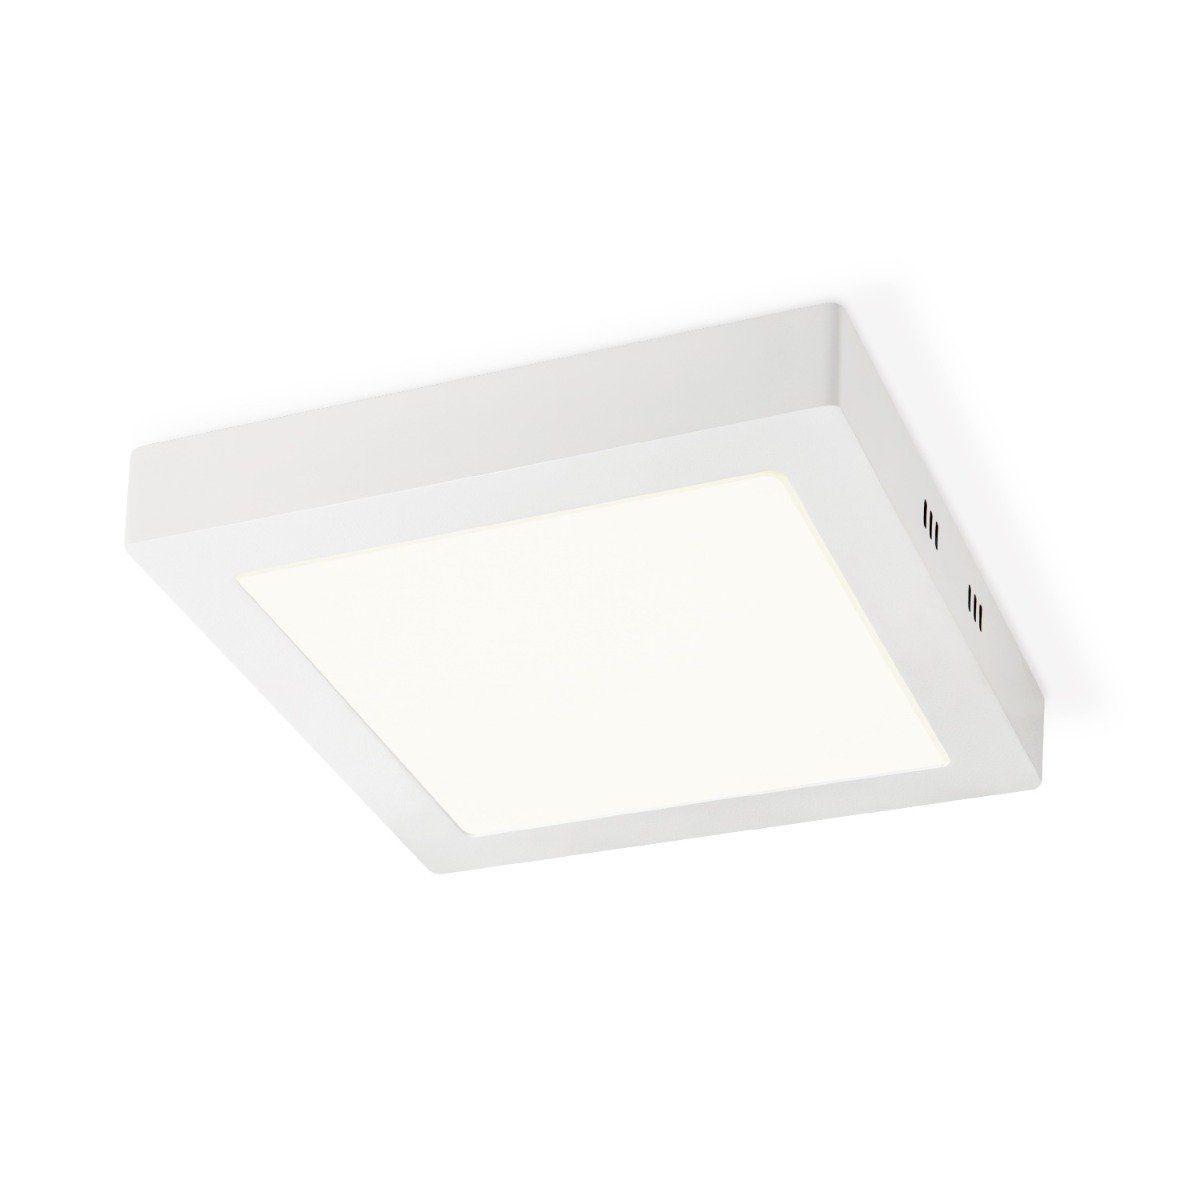 Home sweet home LED plafondlamp Ska vierkant 22,5 - wit